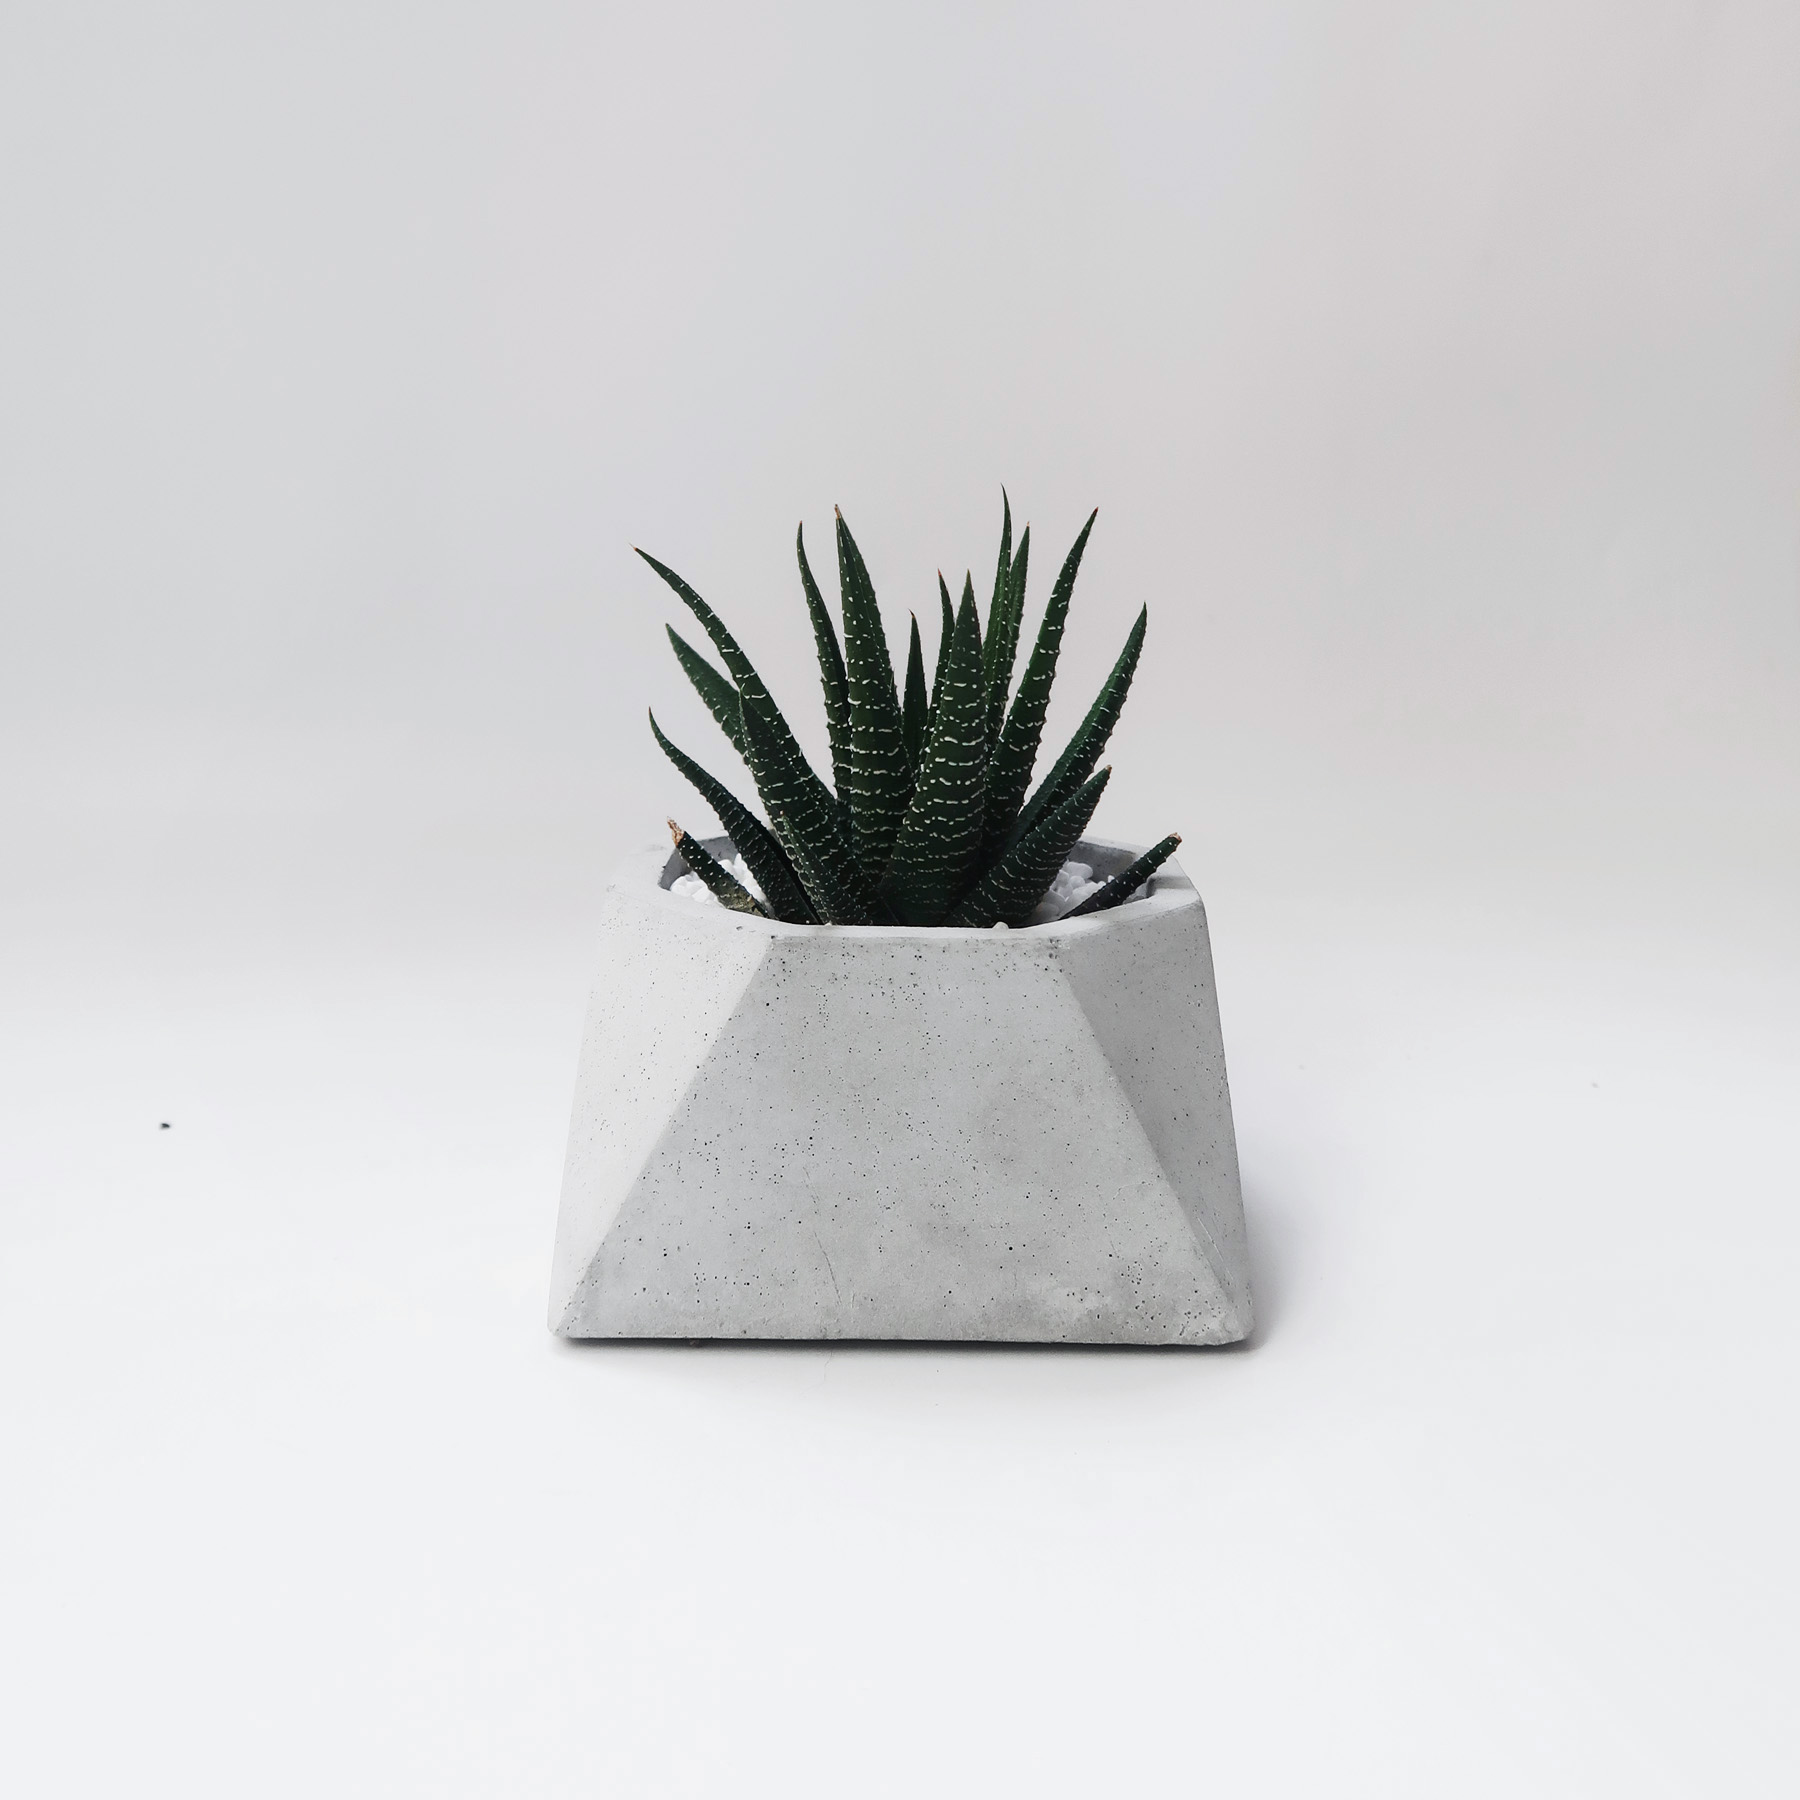 Concrete Design 視角八邊幾何水泥盆器・盆栽・設計禮物